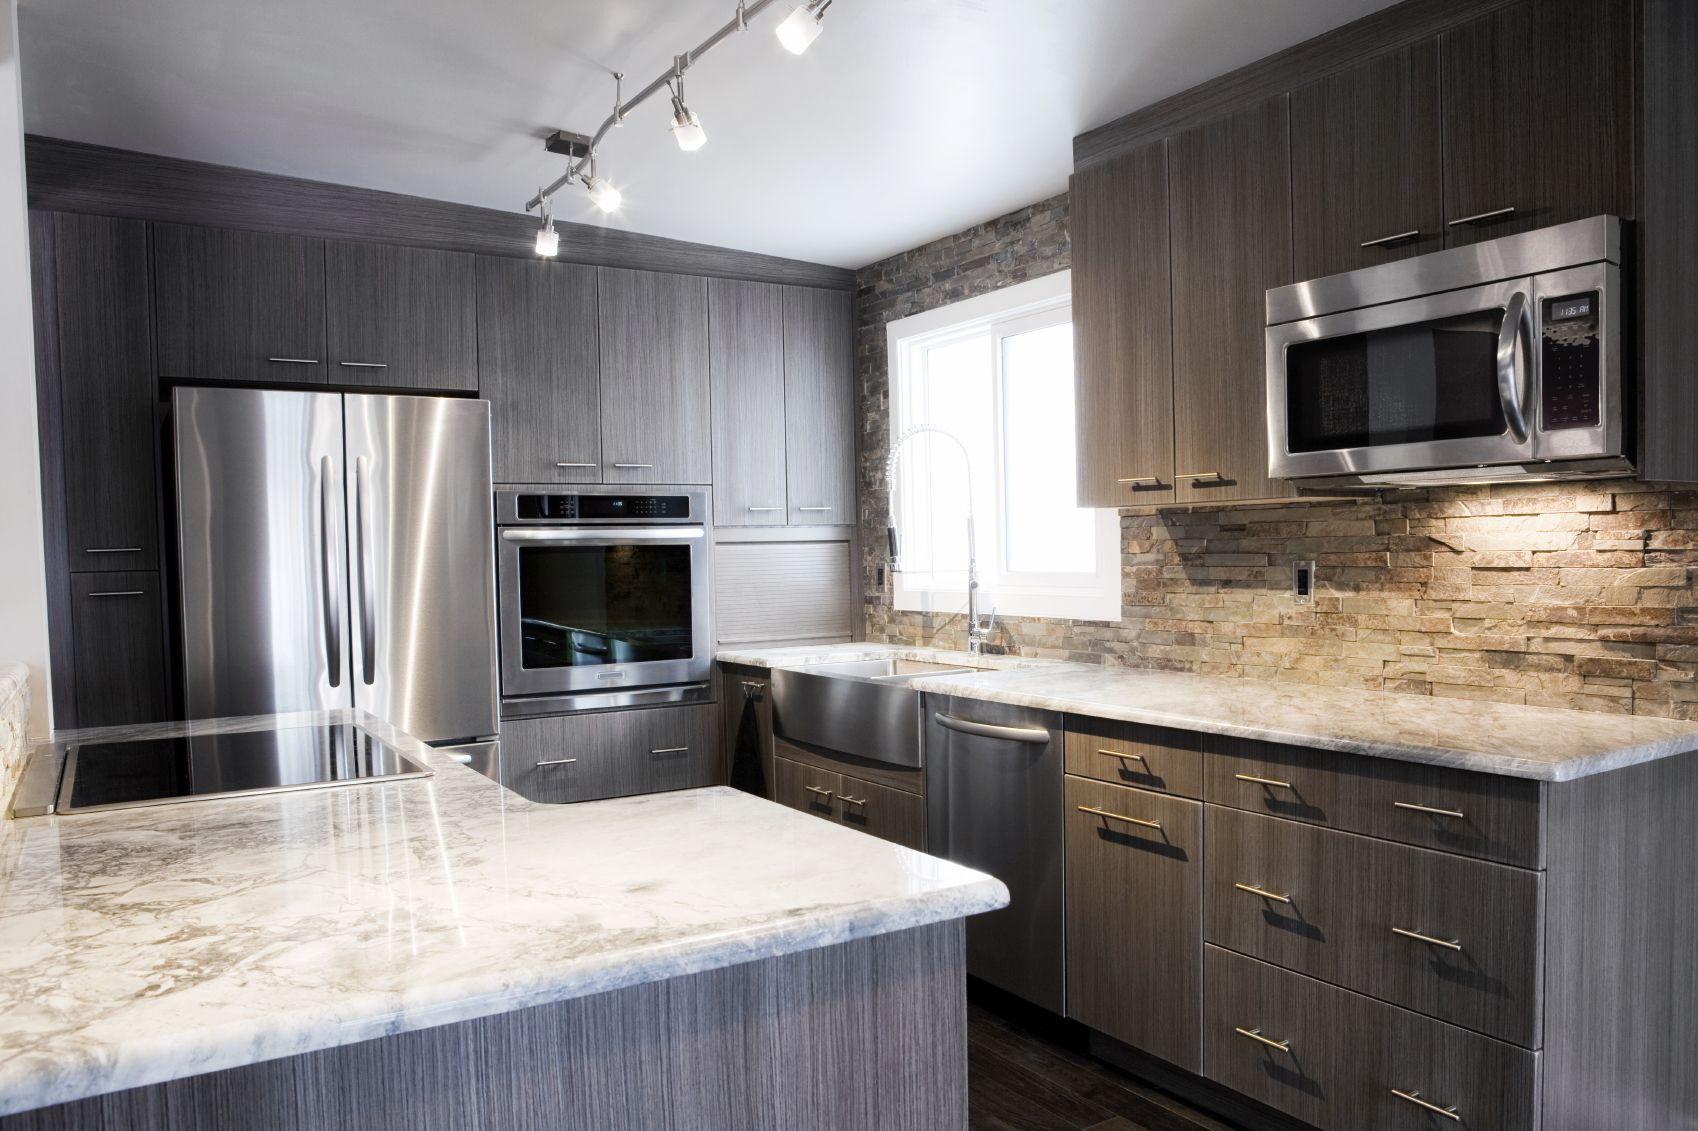 Best Kitchen Gallery: 18 Modern Kitchen Ideas For 2018 300 Photos Wood Grain Dark of Grey Wood Kitchen Cabinets on cal-ite.com